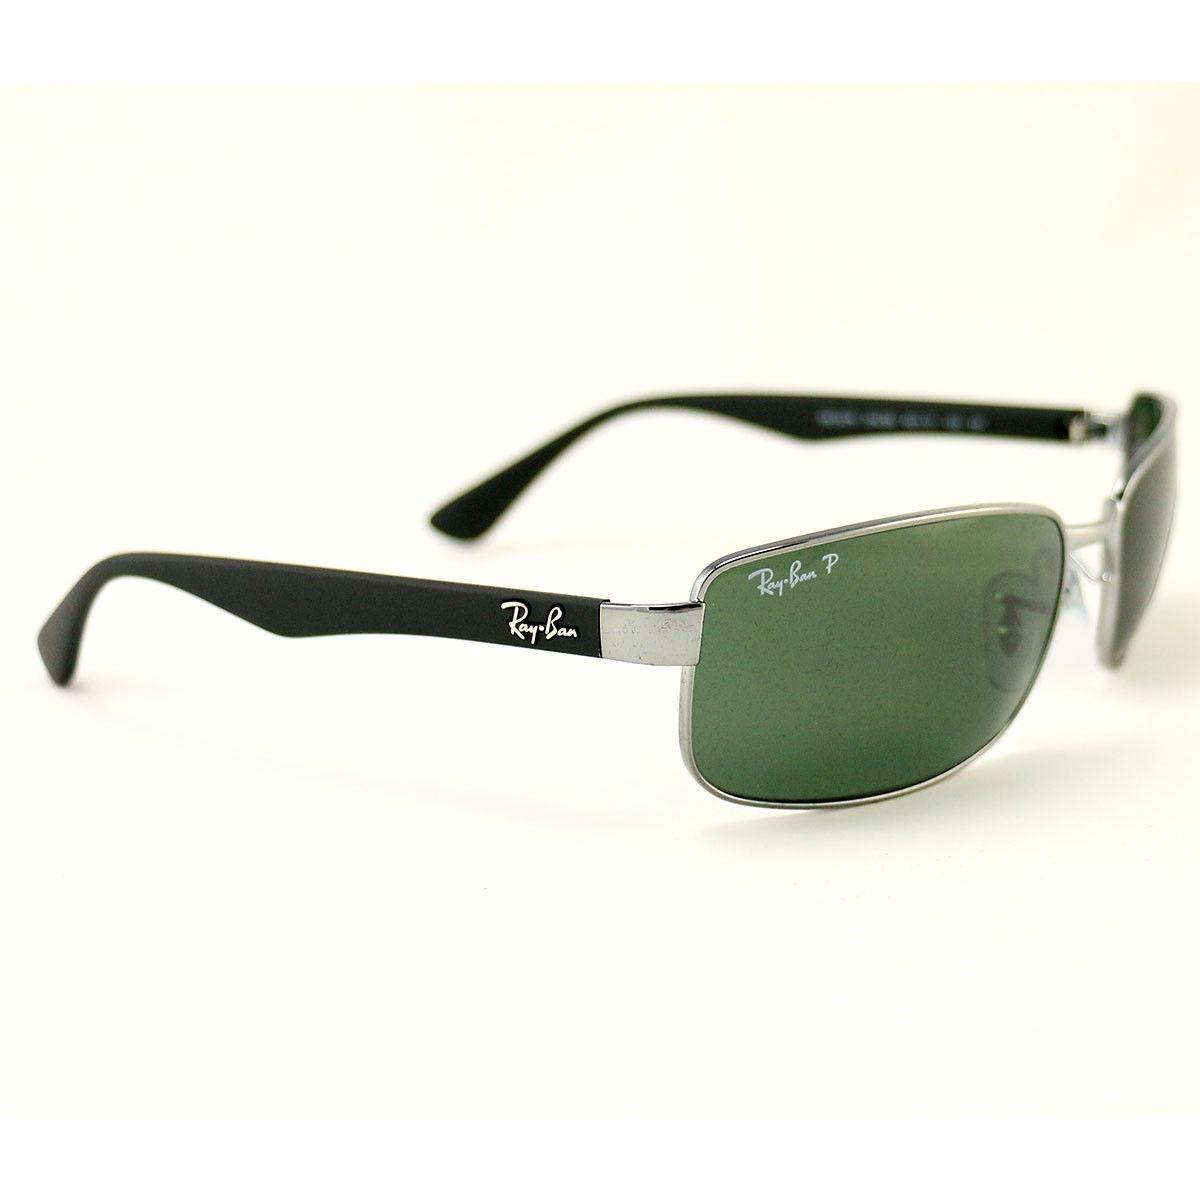 4be4f4f918 Gafas De Sol Polarizadas Ray-ban Rb3478 Gunmetal / Green Cl ...